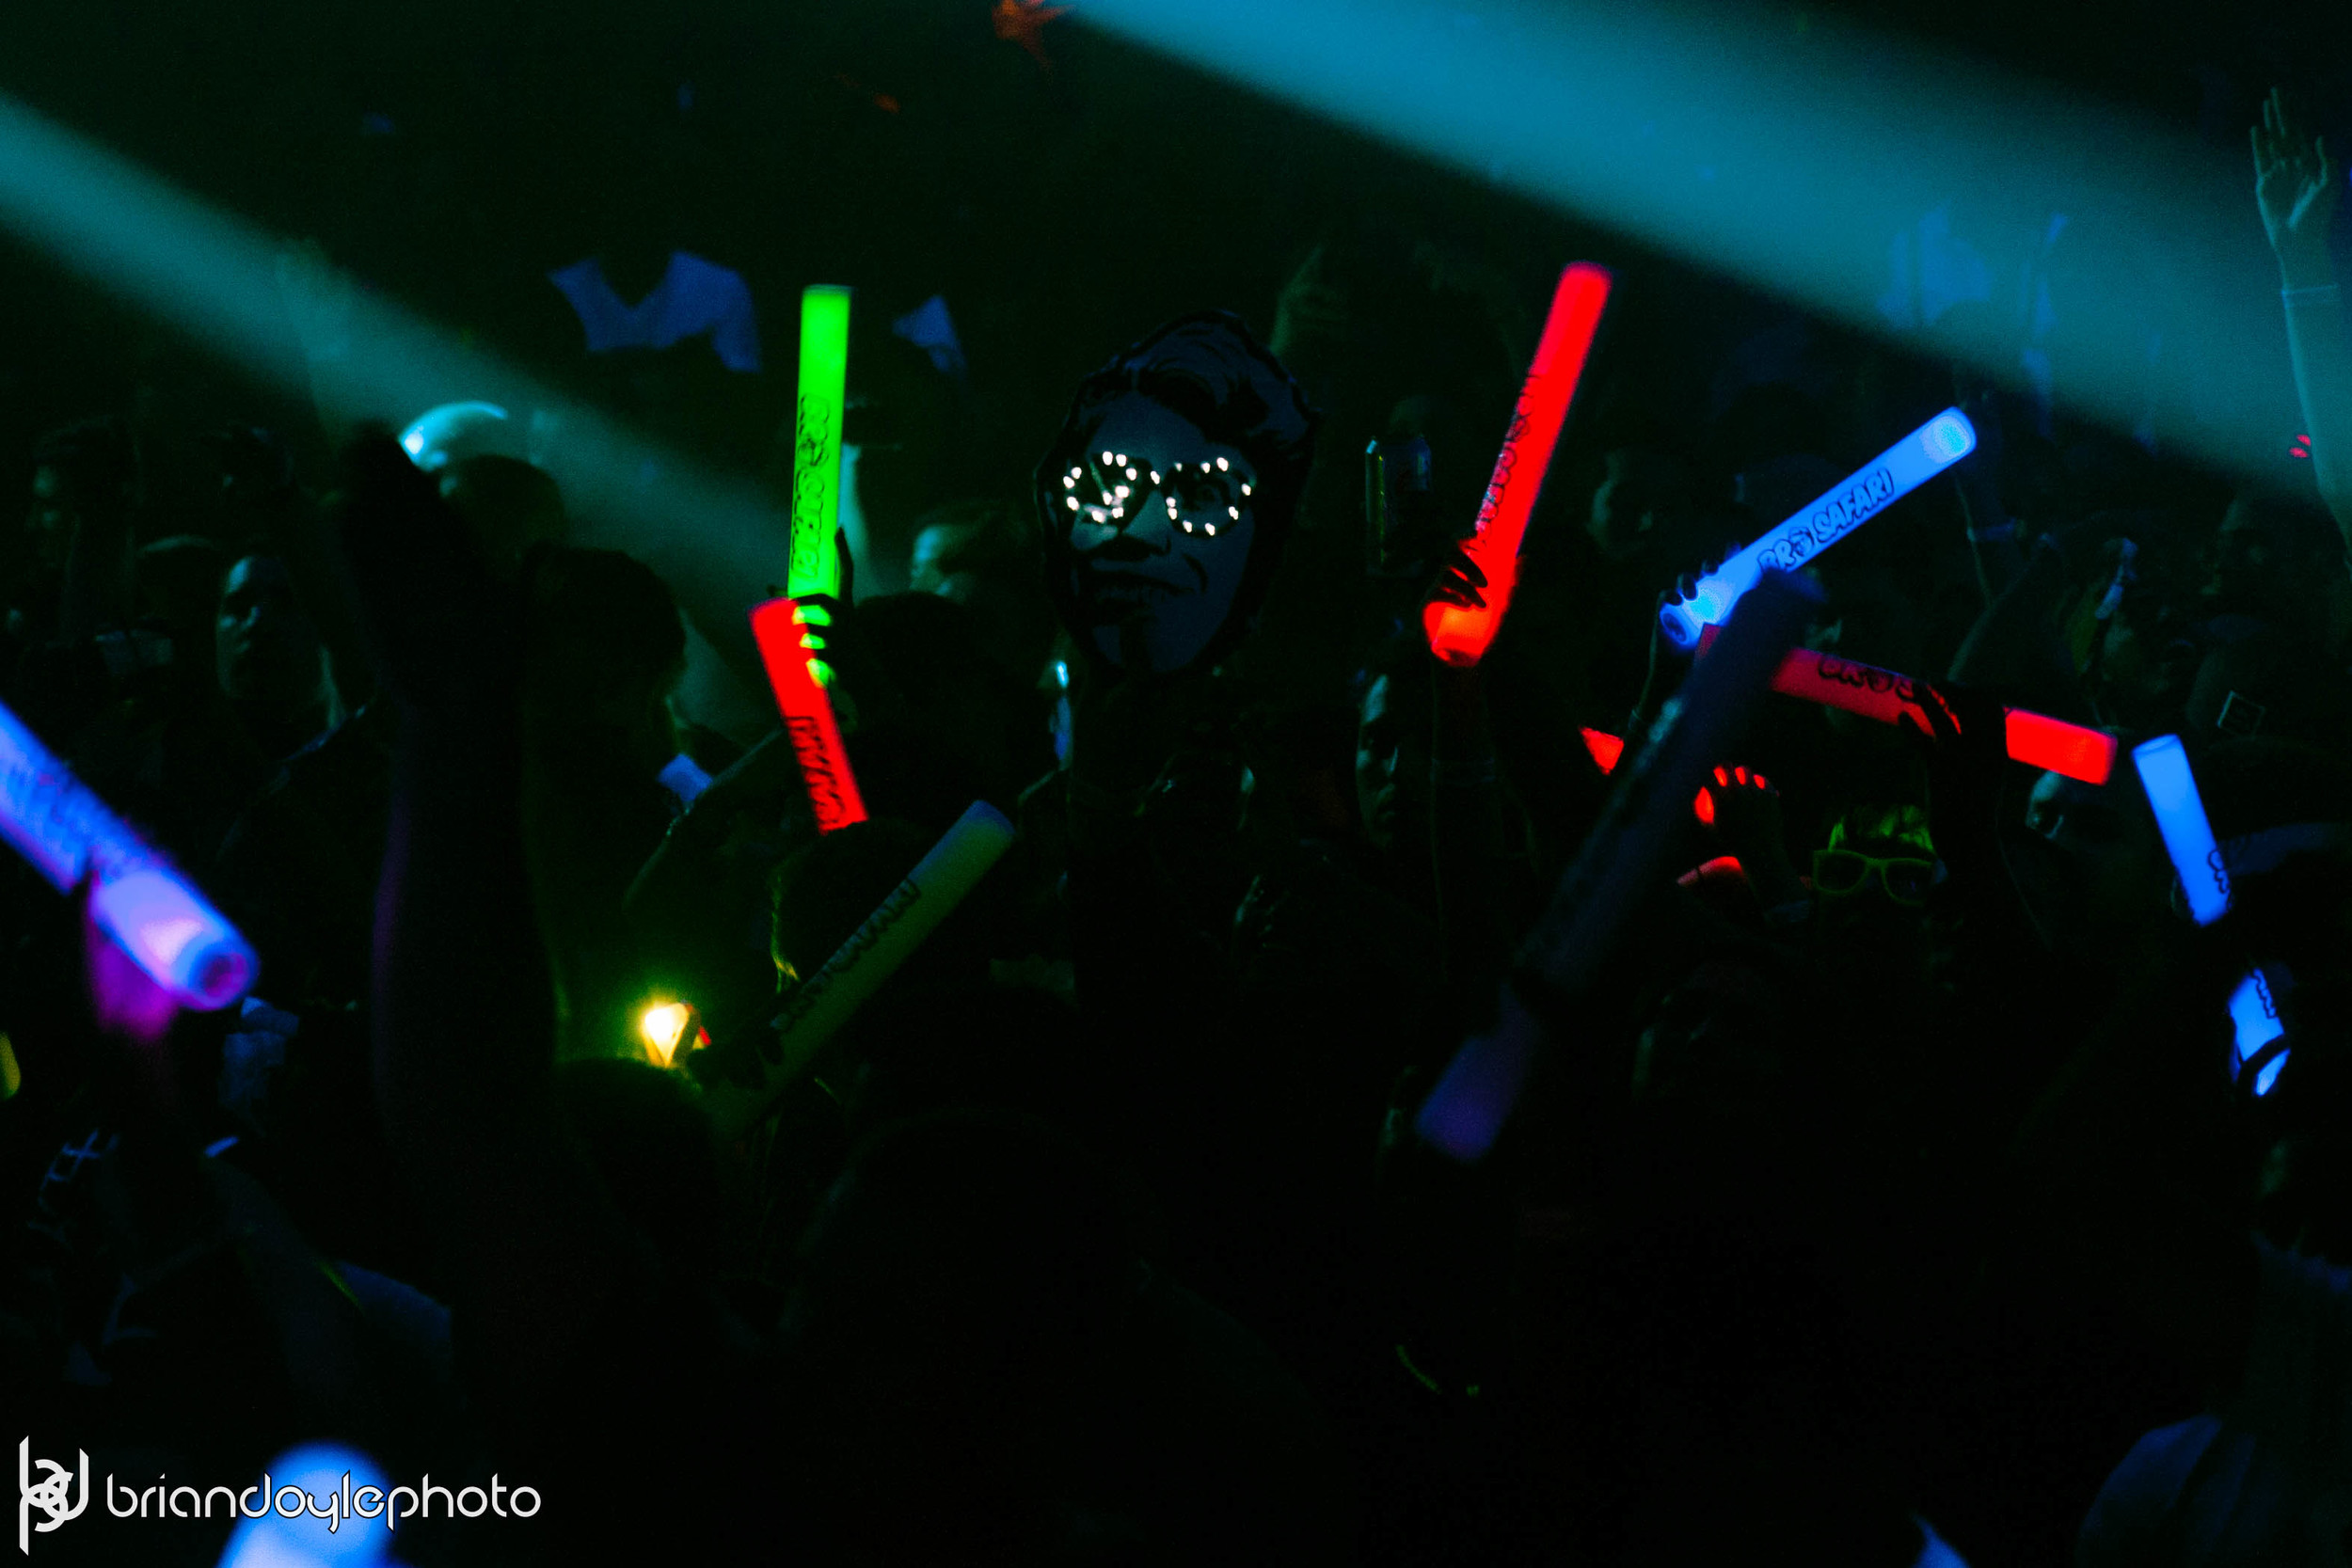 Bro Safari - Black Out Tour @ Avalon bdp 26.09.14-52.jpg